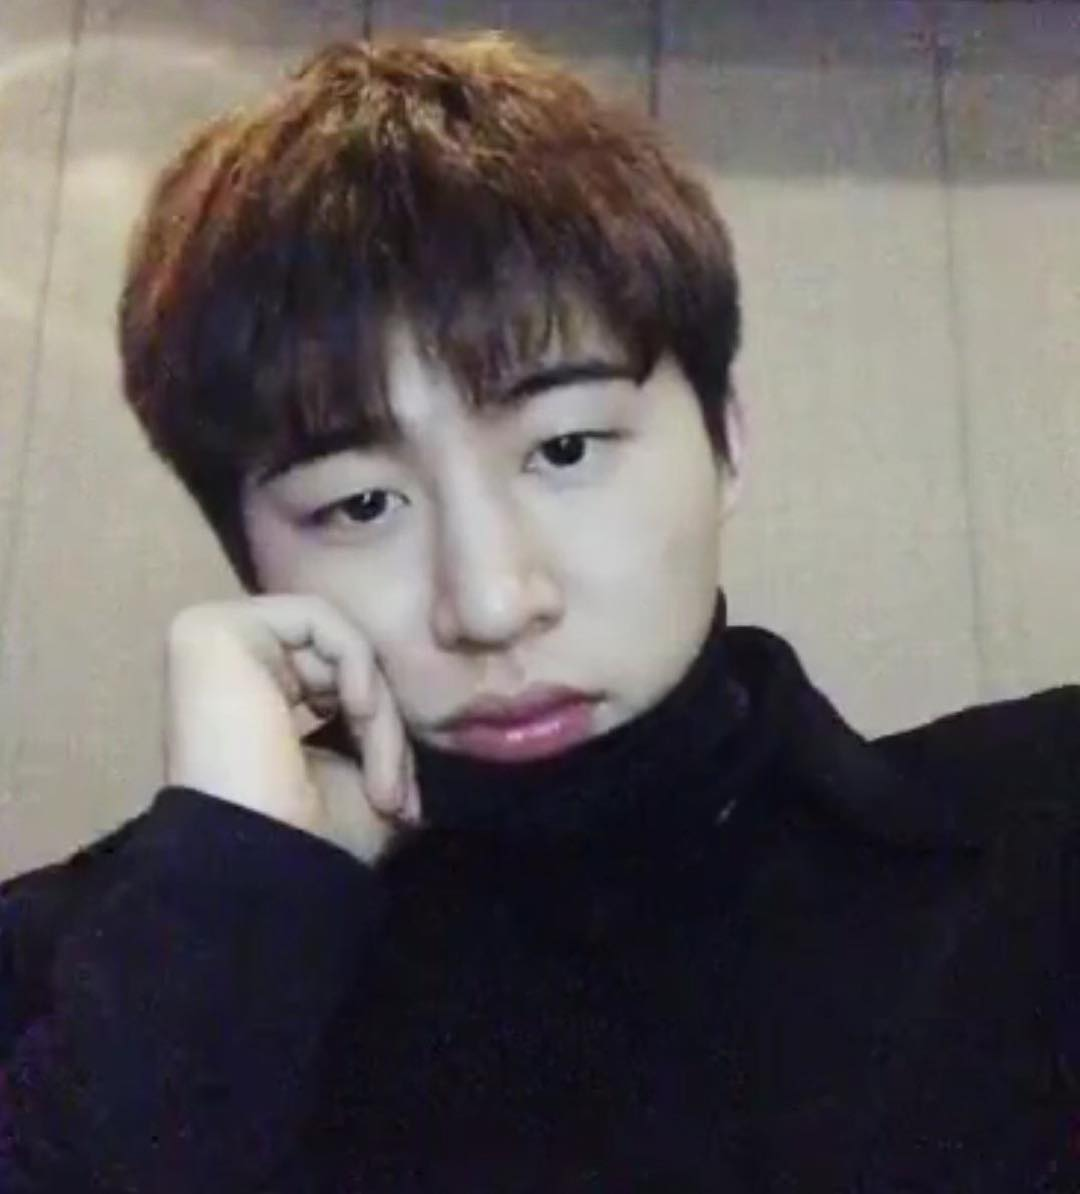 181219 Hanbin CH+ Live Talks : Please give iKON's Repackged